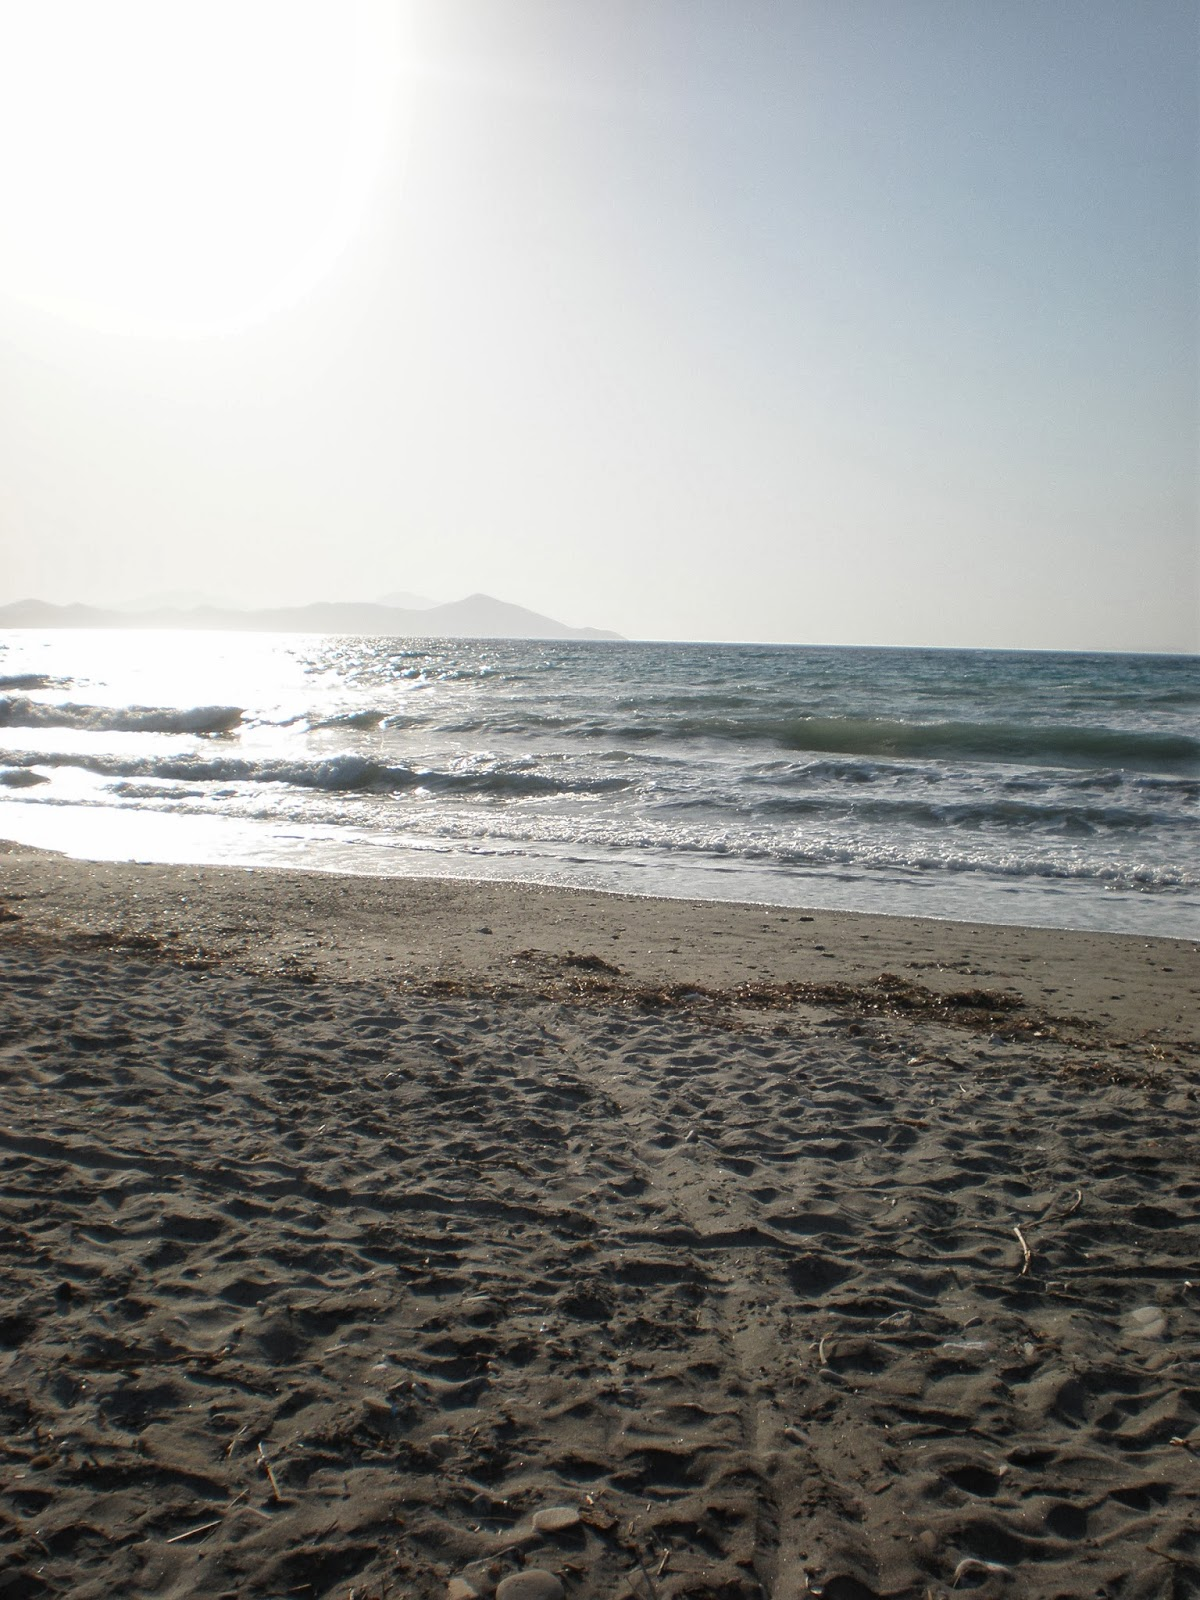 lambi beach, paradise, private beach, empty beach, relax, sea, sun, sand, holiday, Kos, Greece, Europe, traditional church, view, mountain, zia, lambi, kos town, beautiful view, travel, travelling, holiday, sea, sun,